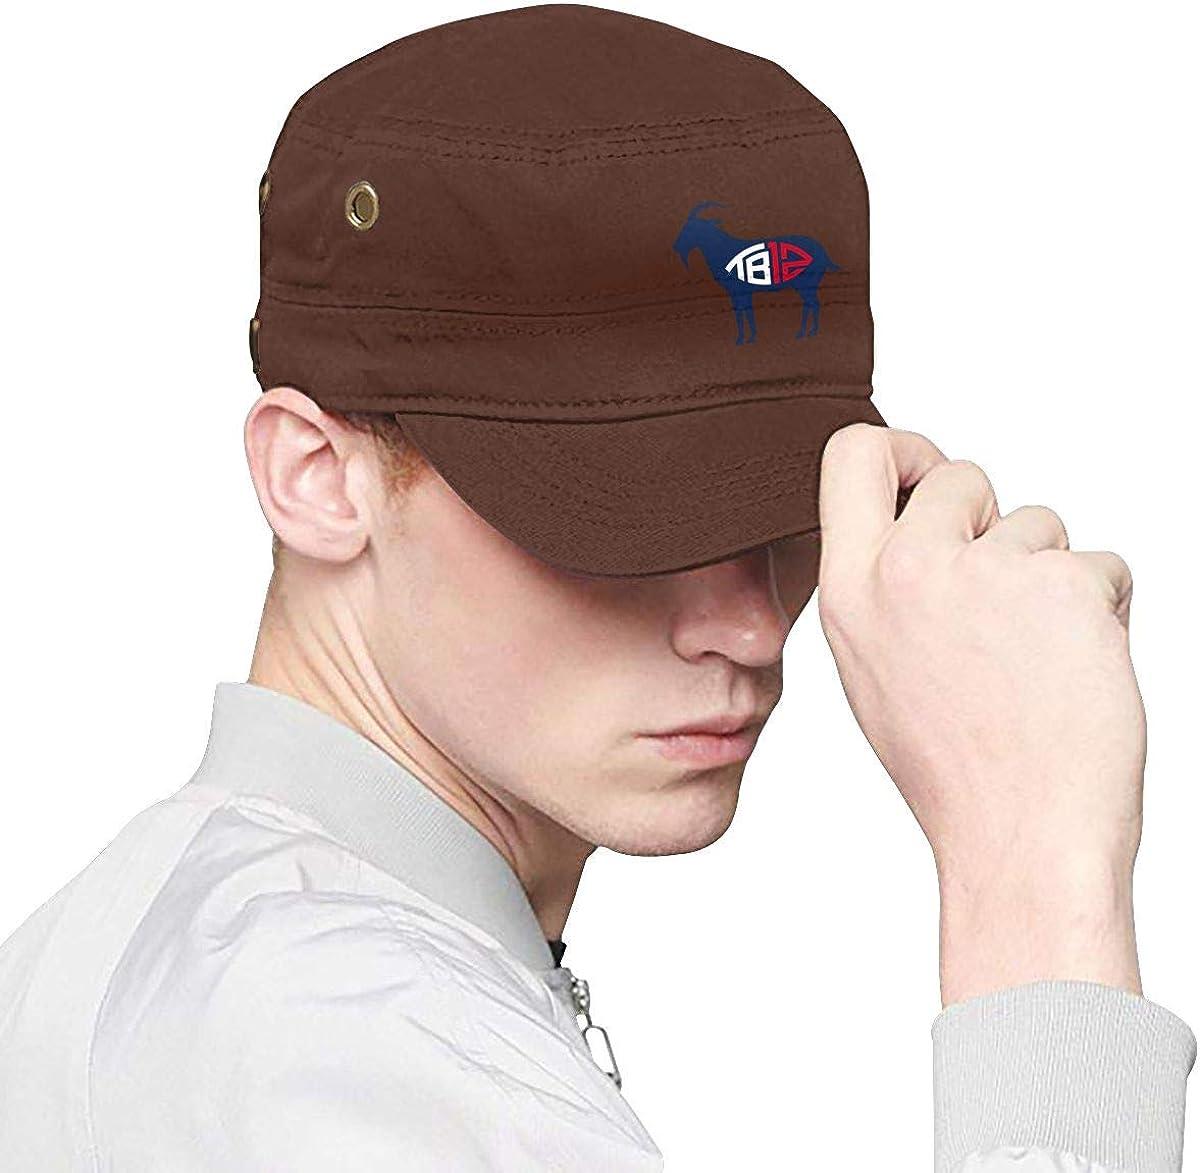 TB12 Goat Men Classics Cap Womens Fashion Hat Hats